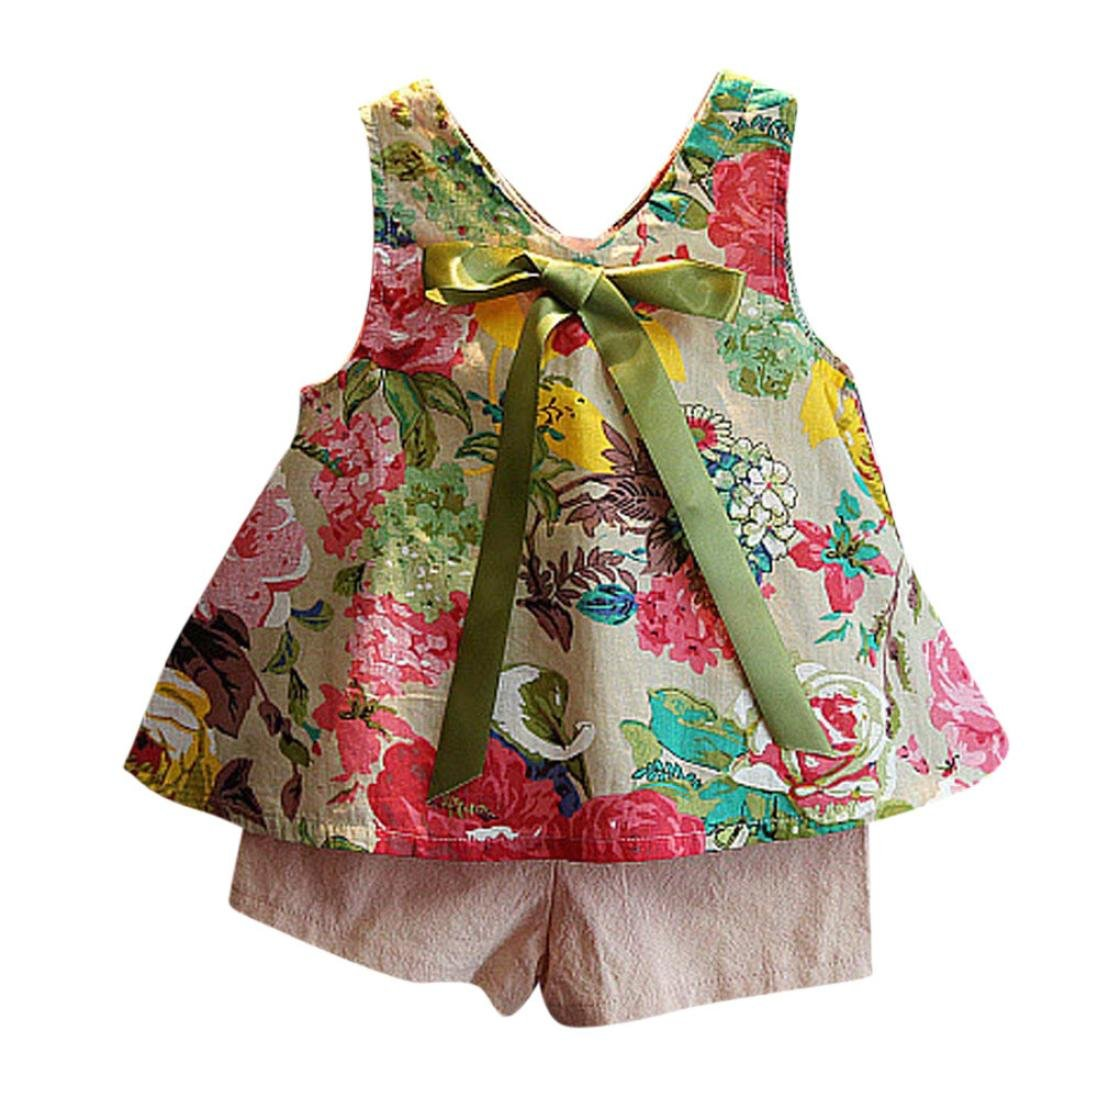 Vestidos niñas, Switchali Niños Bebé Niña Verano moda blusas chaleco floral camisa + bowknot Pantalones